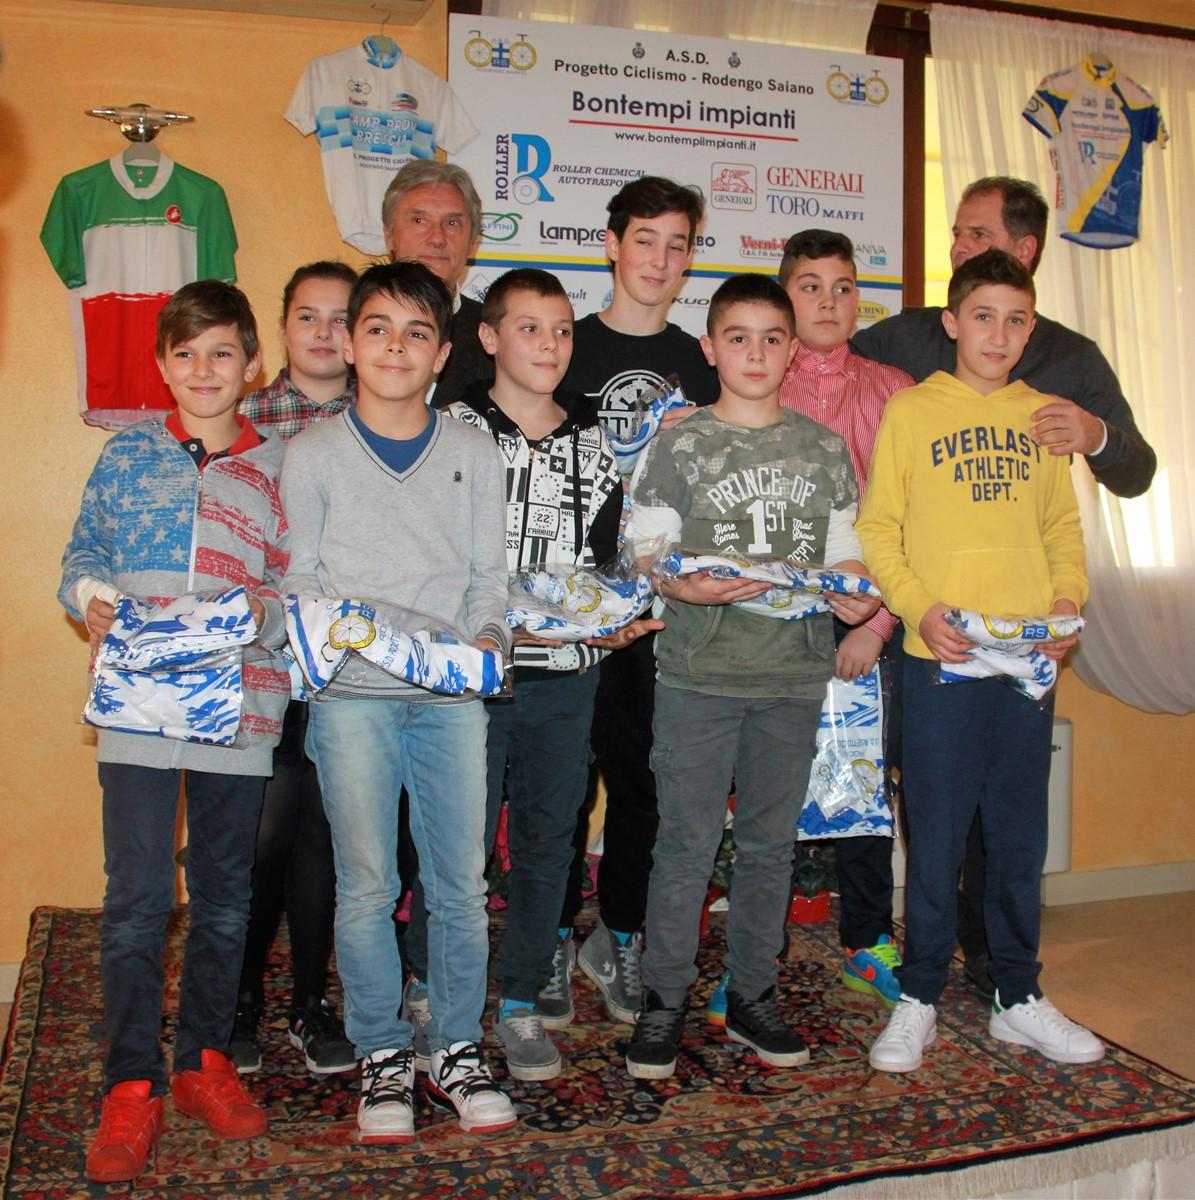 Saronni premia i Giovanissimi G6